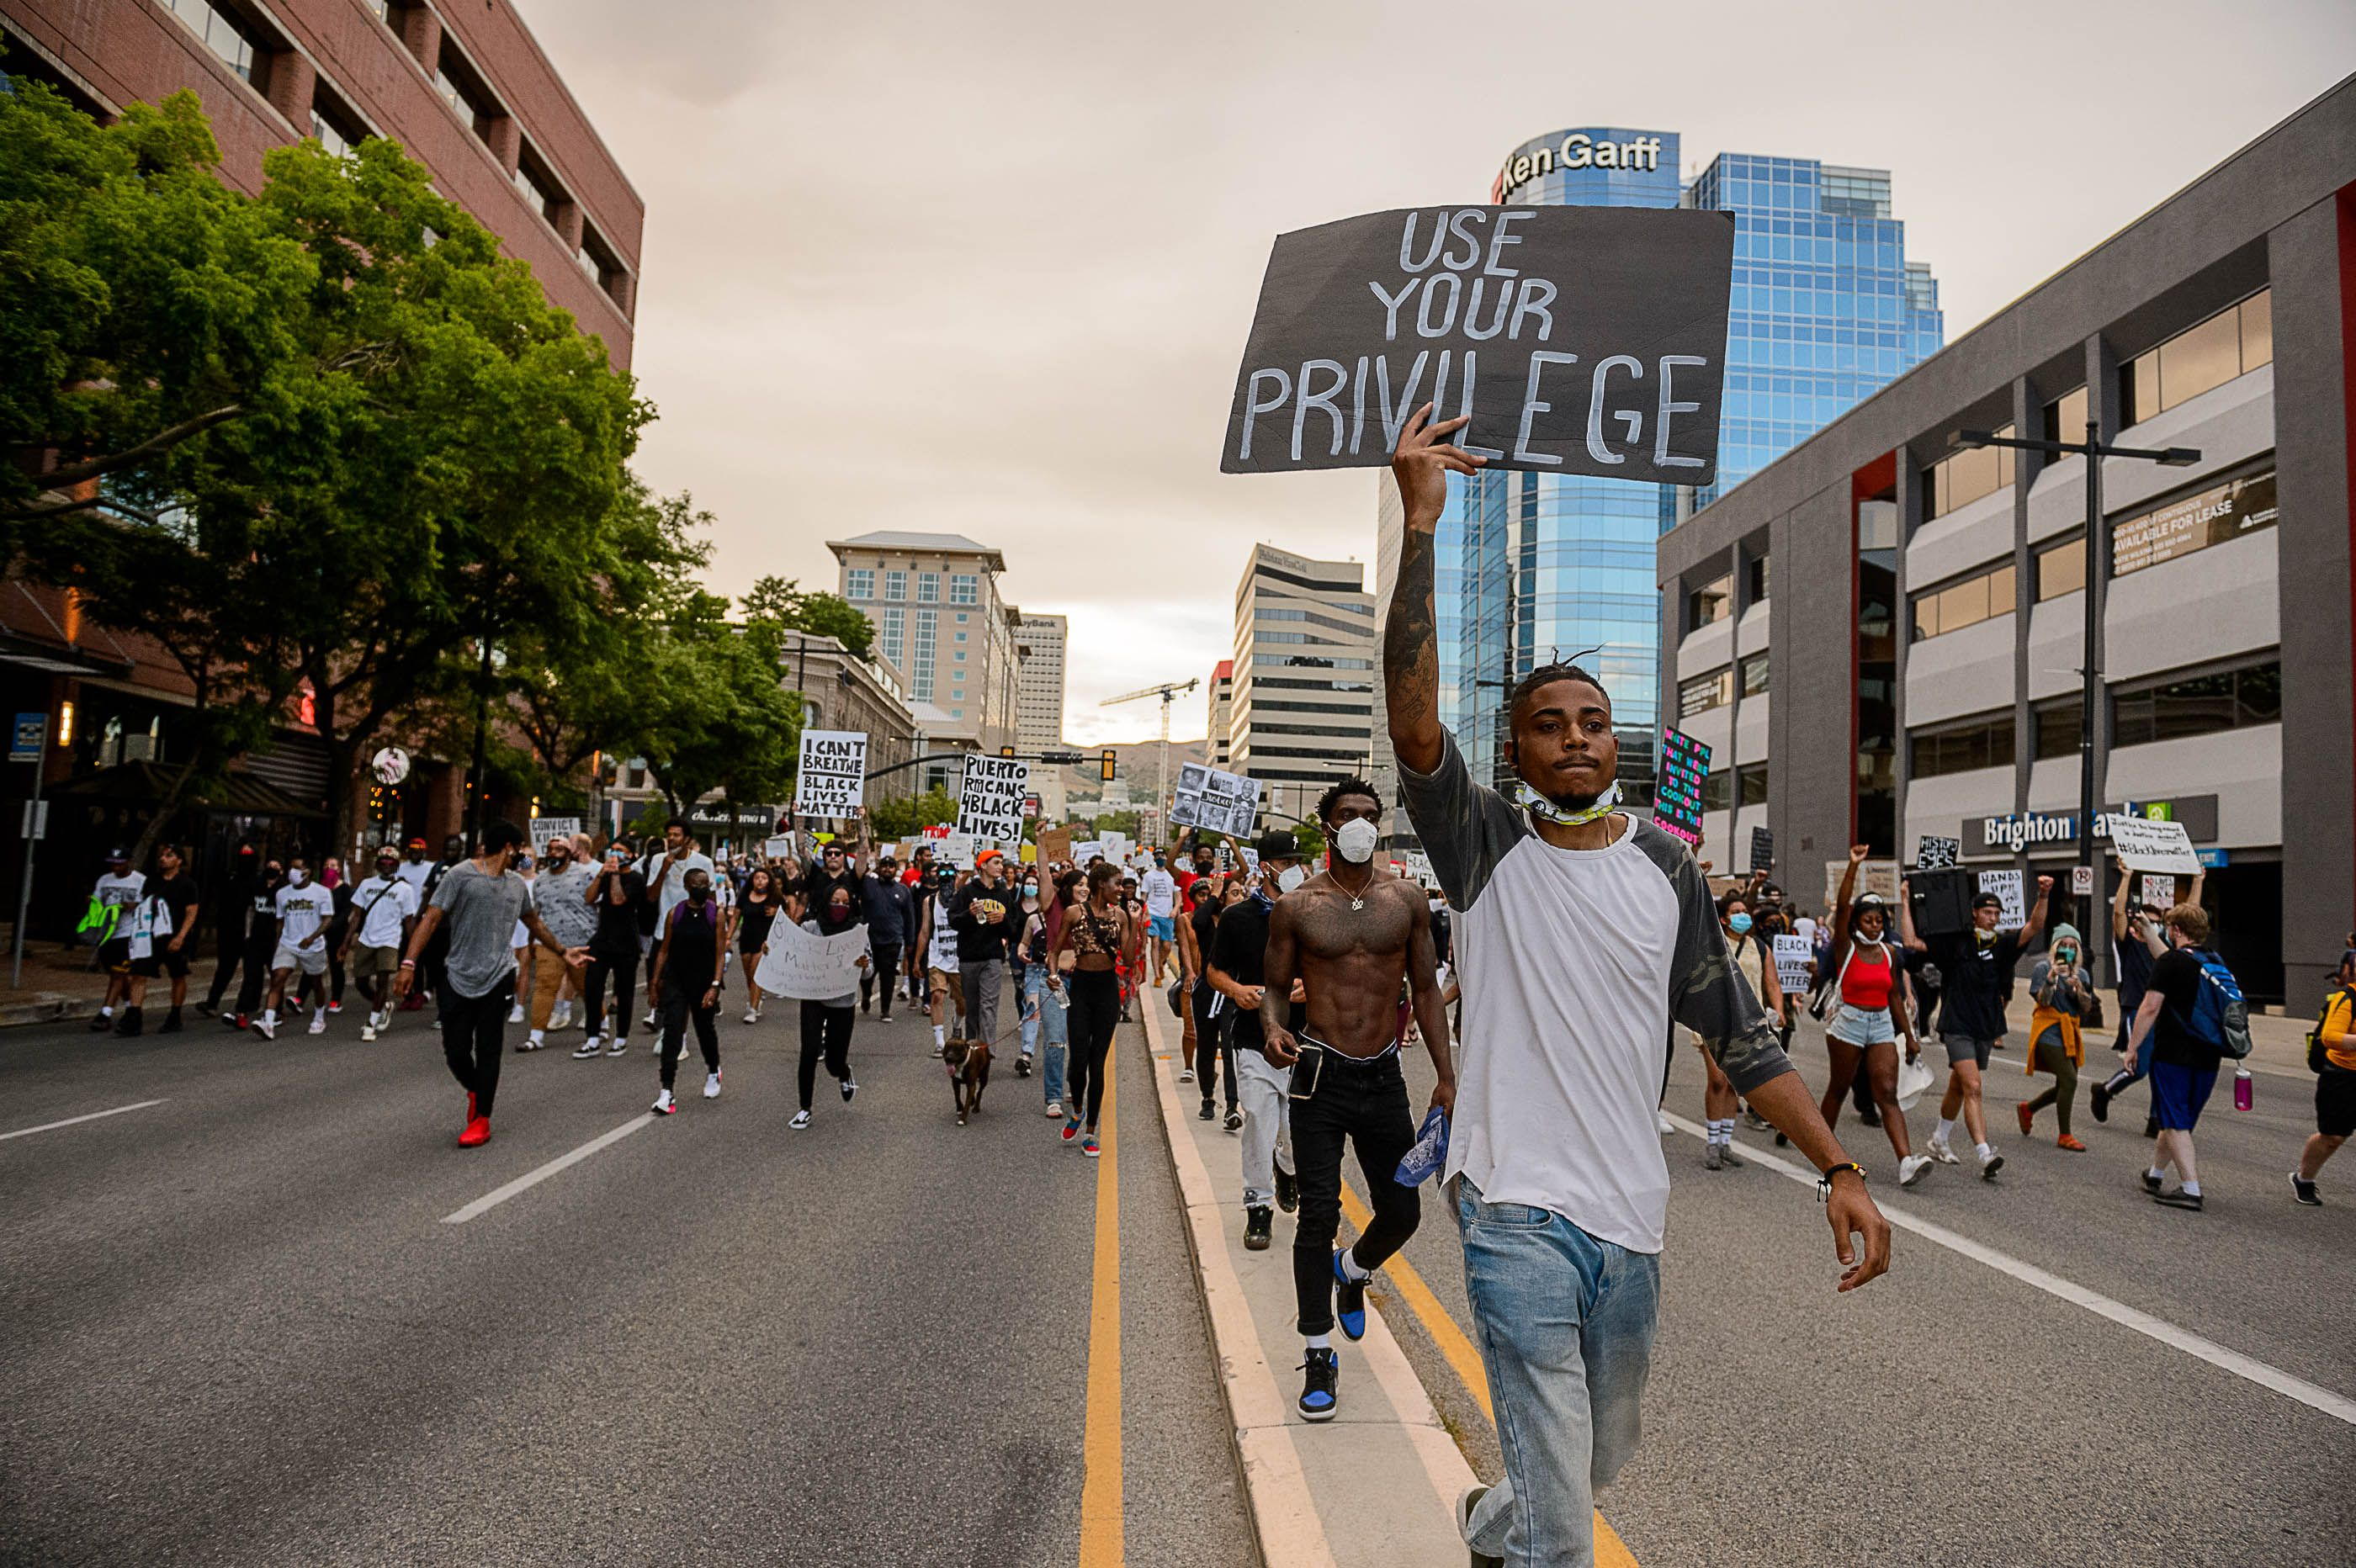 (Trent Nelson  |  The Salt Lake Tribune) Protesters march against police brutality in Salt Lake City on Thursday, June 4, 2020.